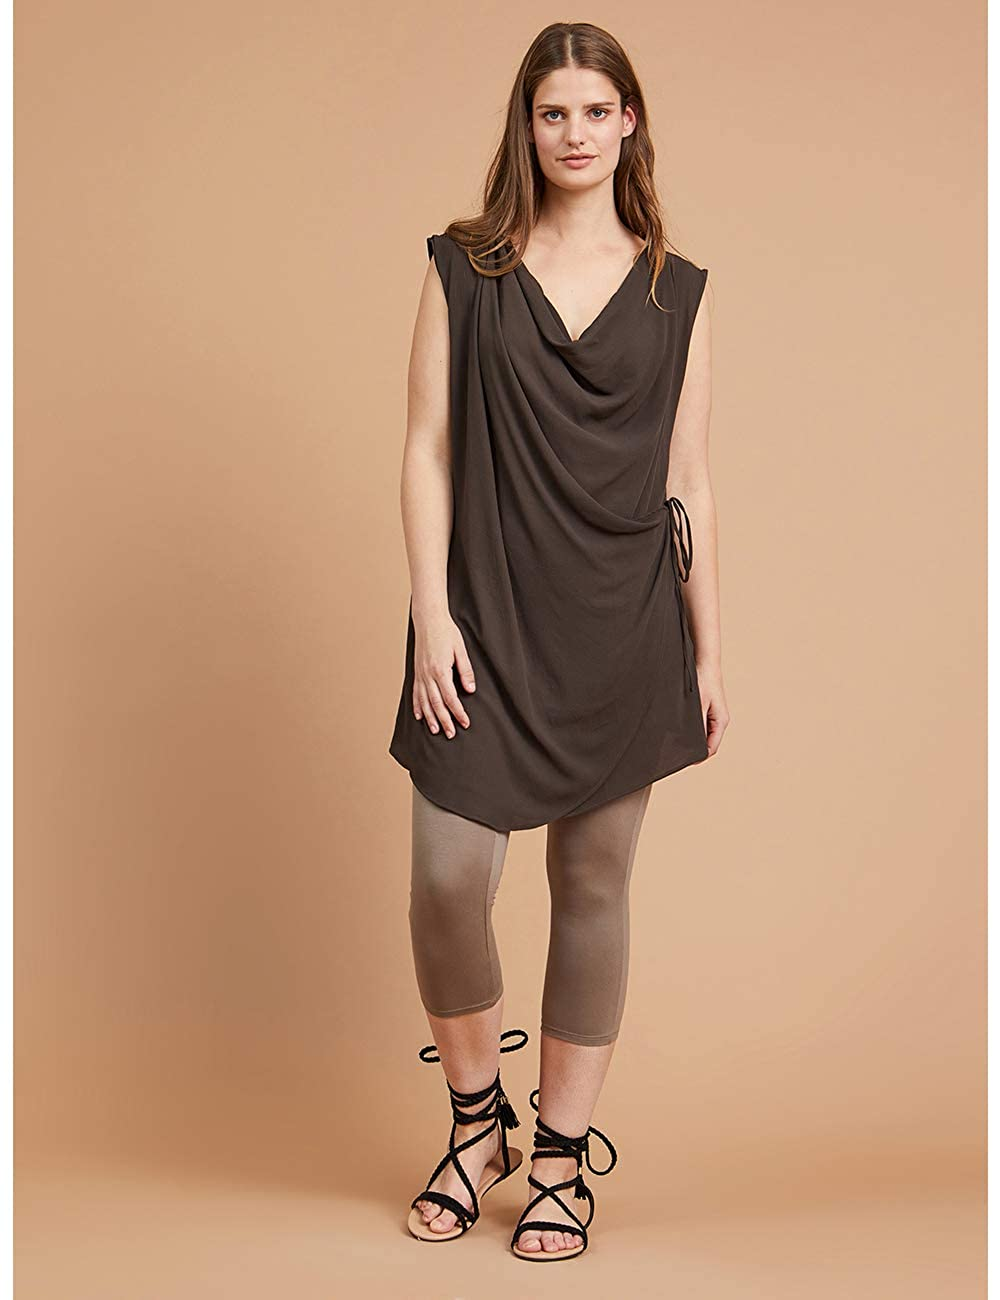 Fiorella Rubino Leggings Corti Basic Italian Plus Size